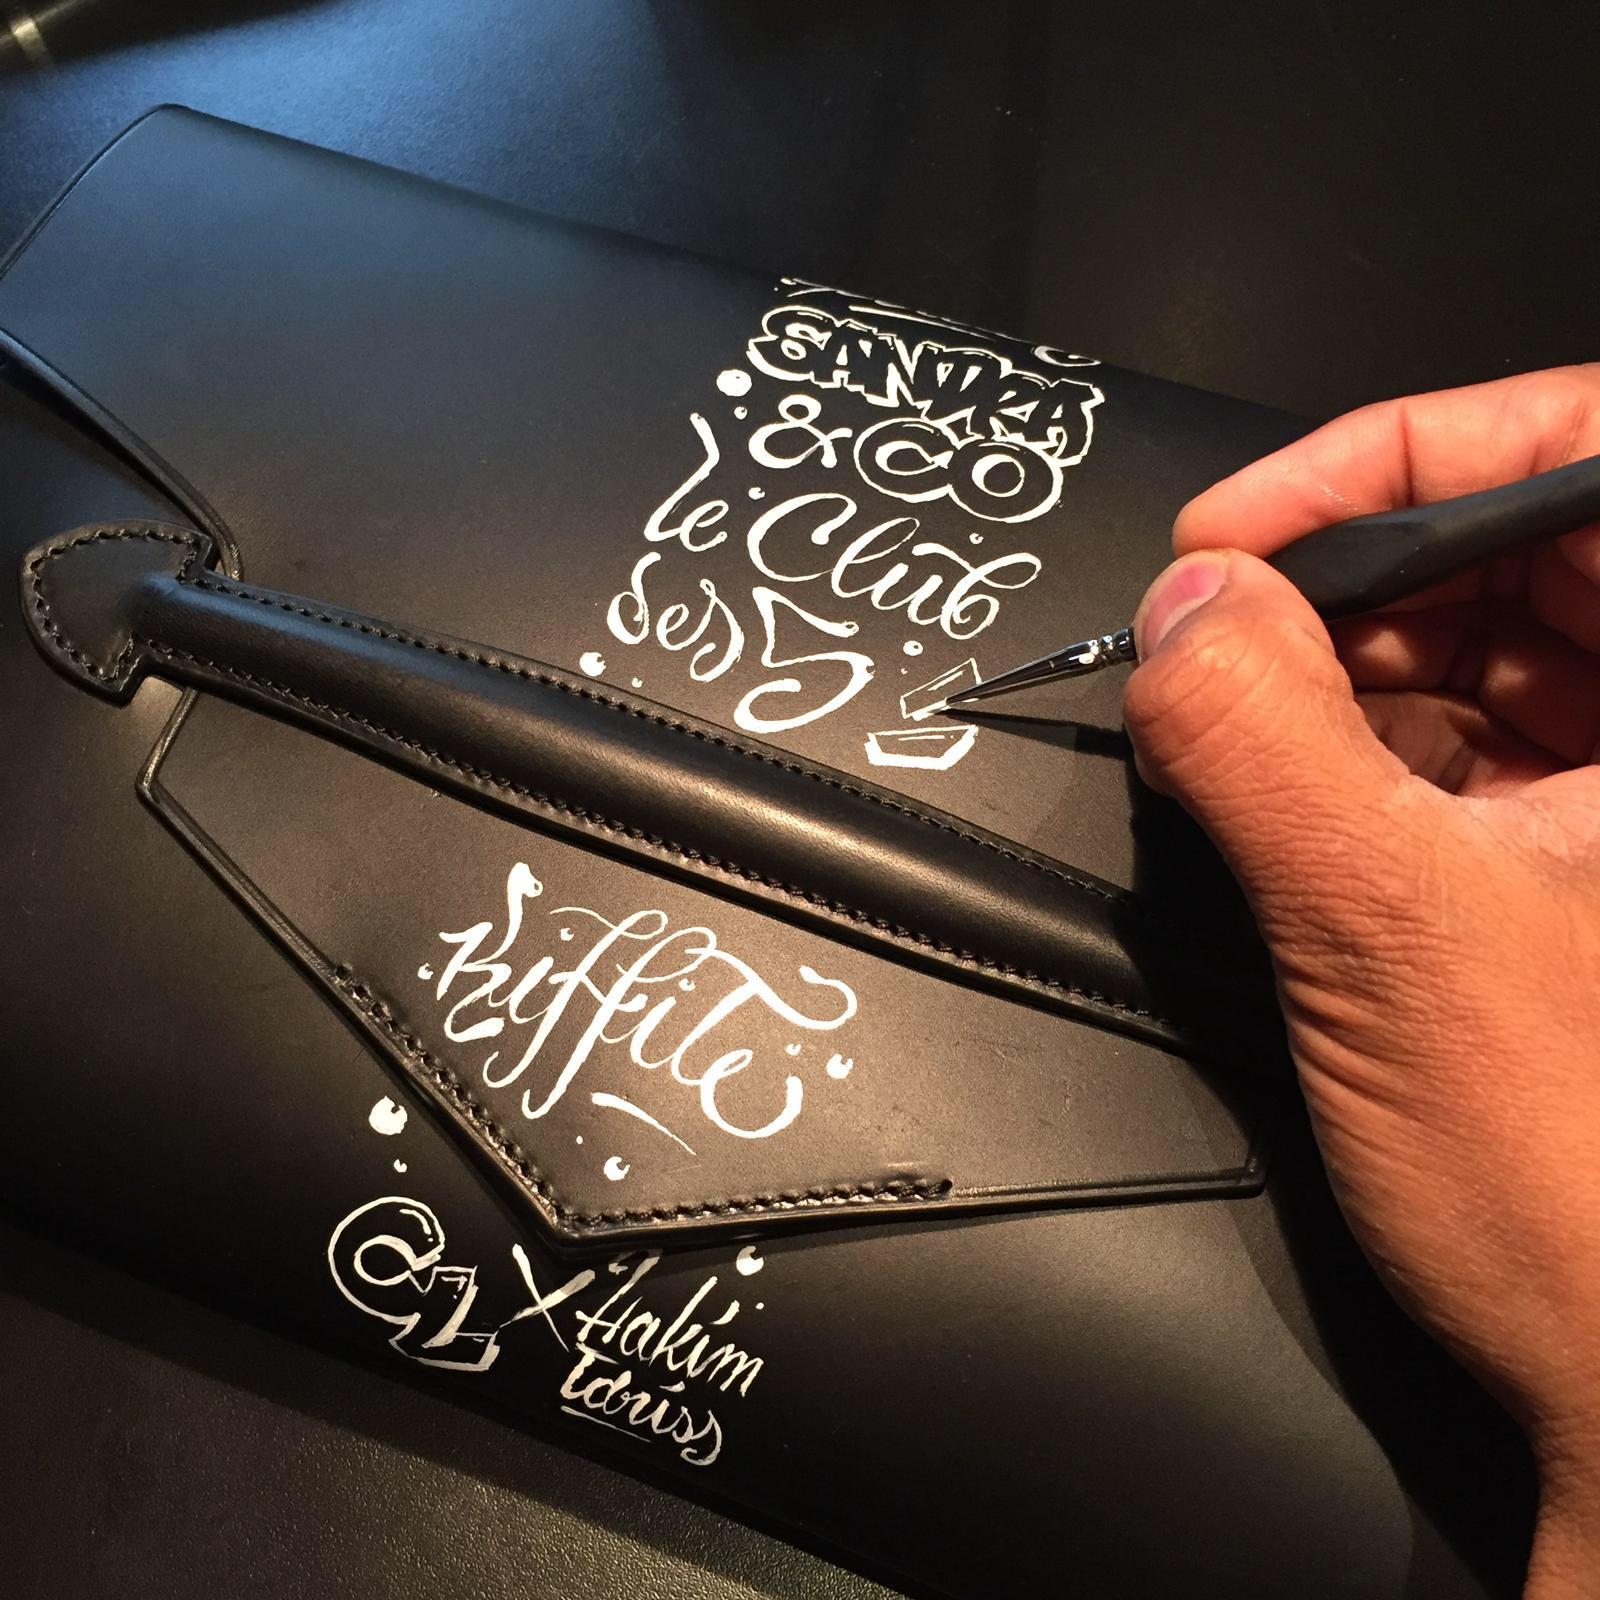 Peinture, cuir, pochette noir, paris, customisation